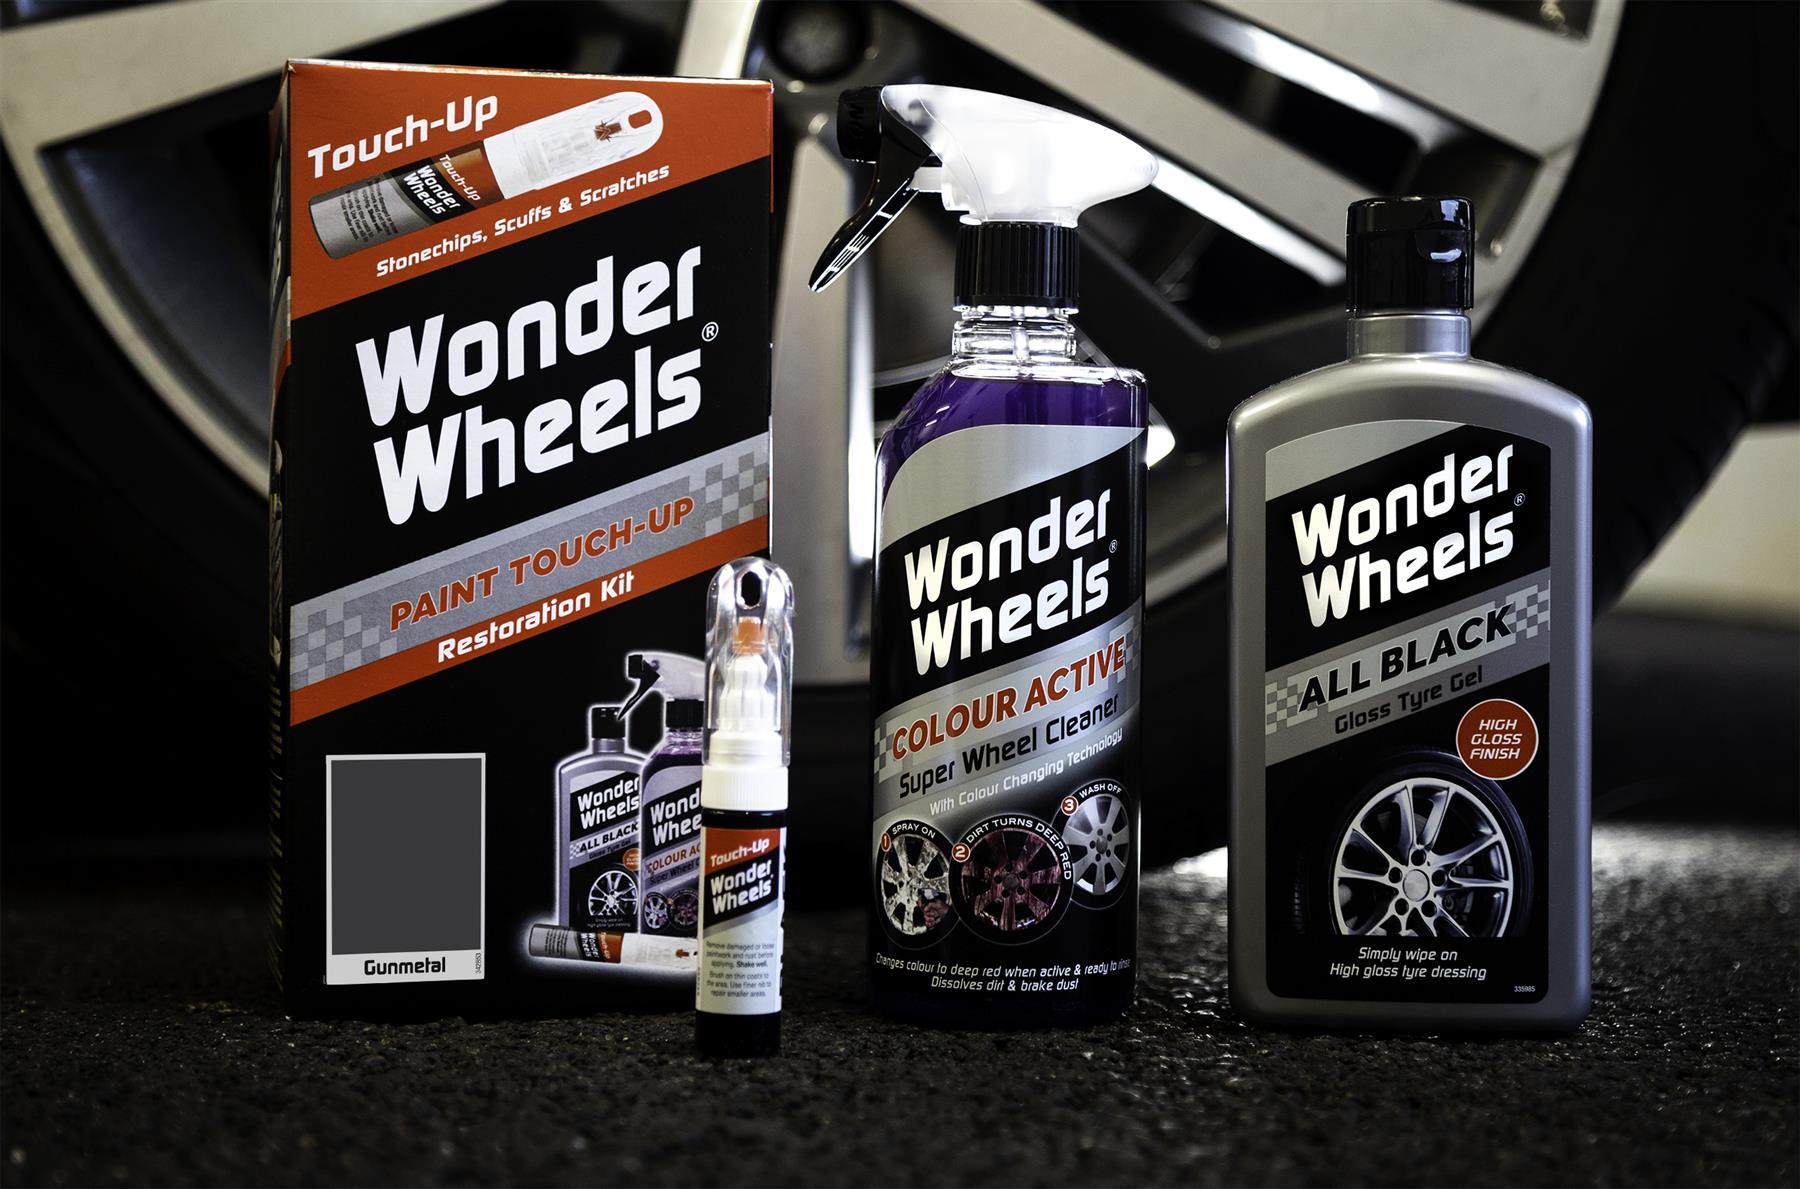 thumbnail 14 - Wonder-Wheels-Paint-Touch-Up-Restoration-Kit